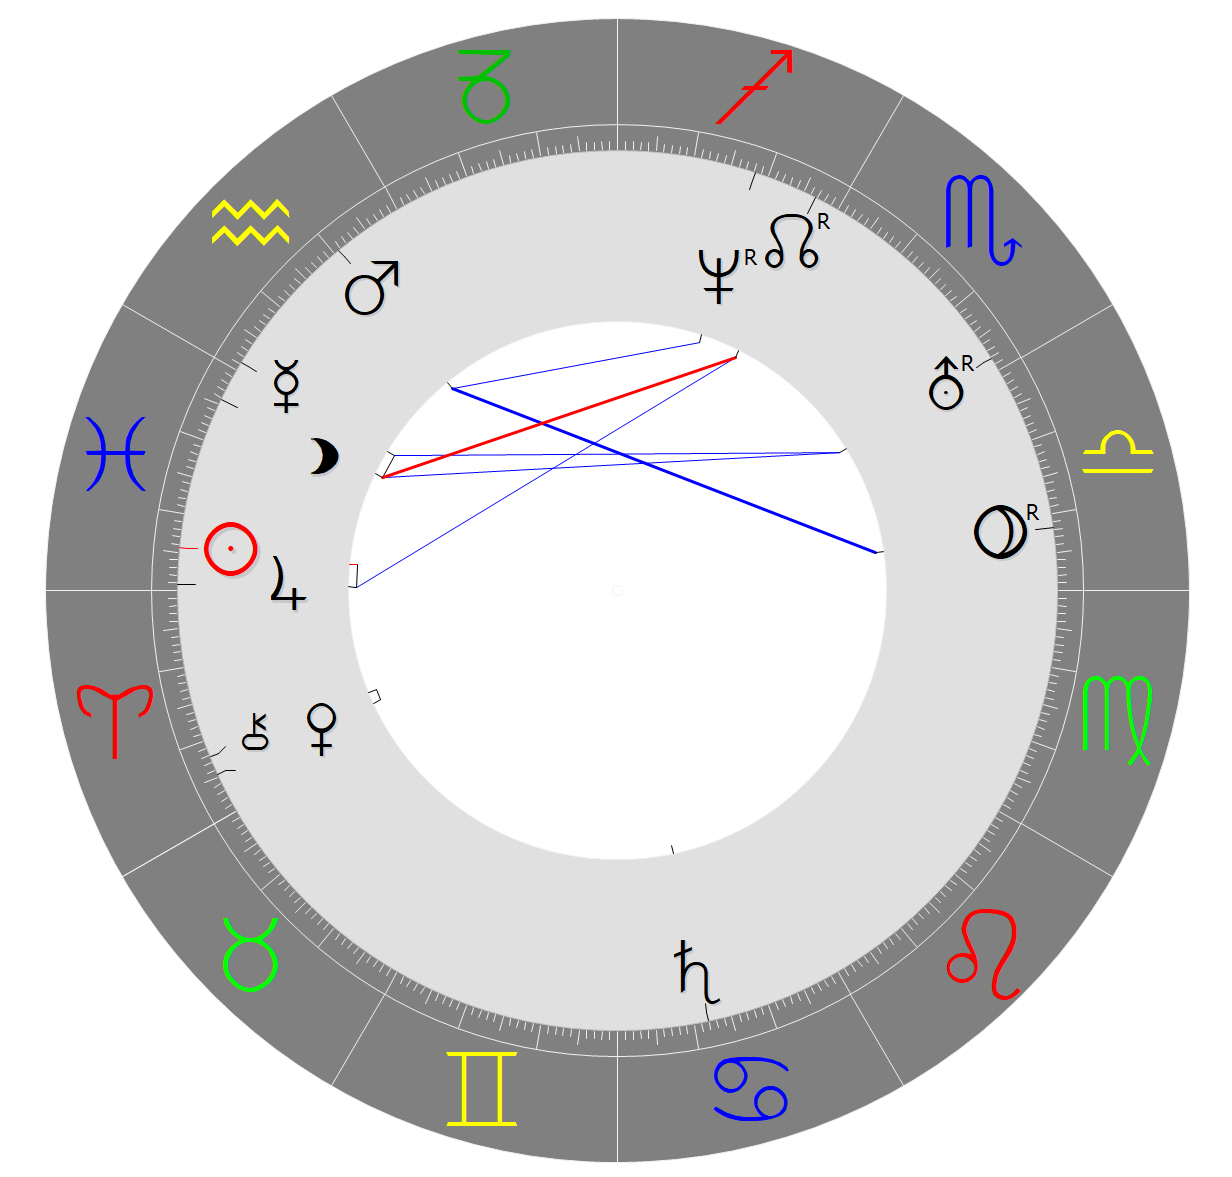 7. Runde: Rate-Horoskop